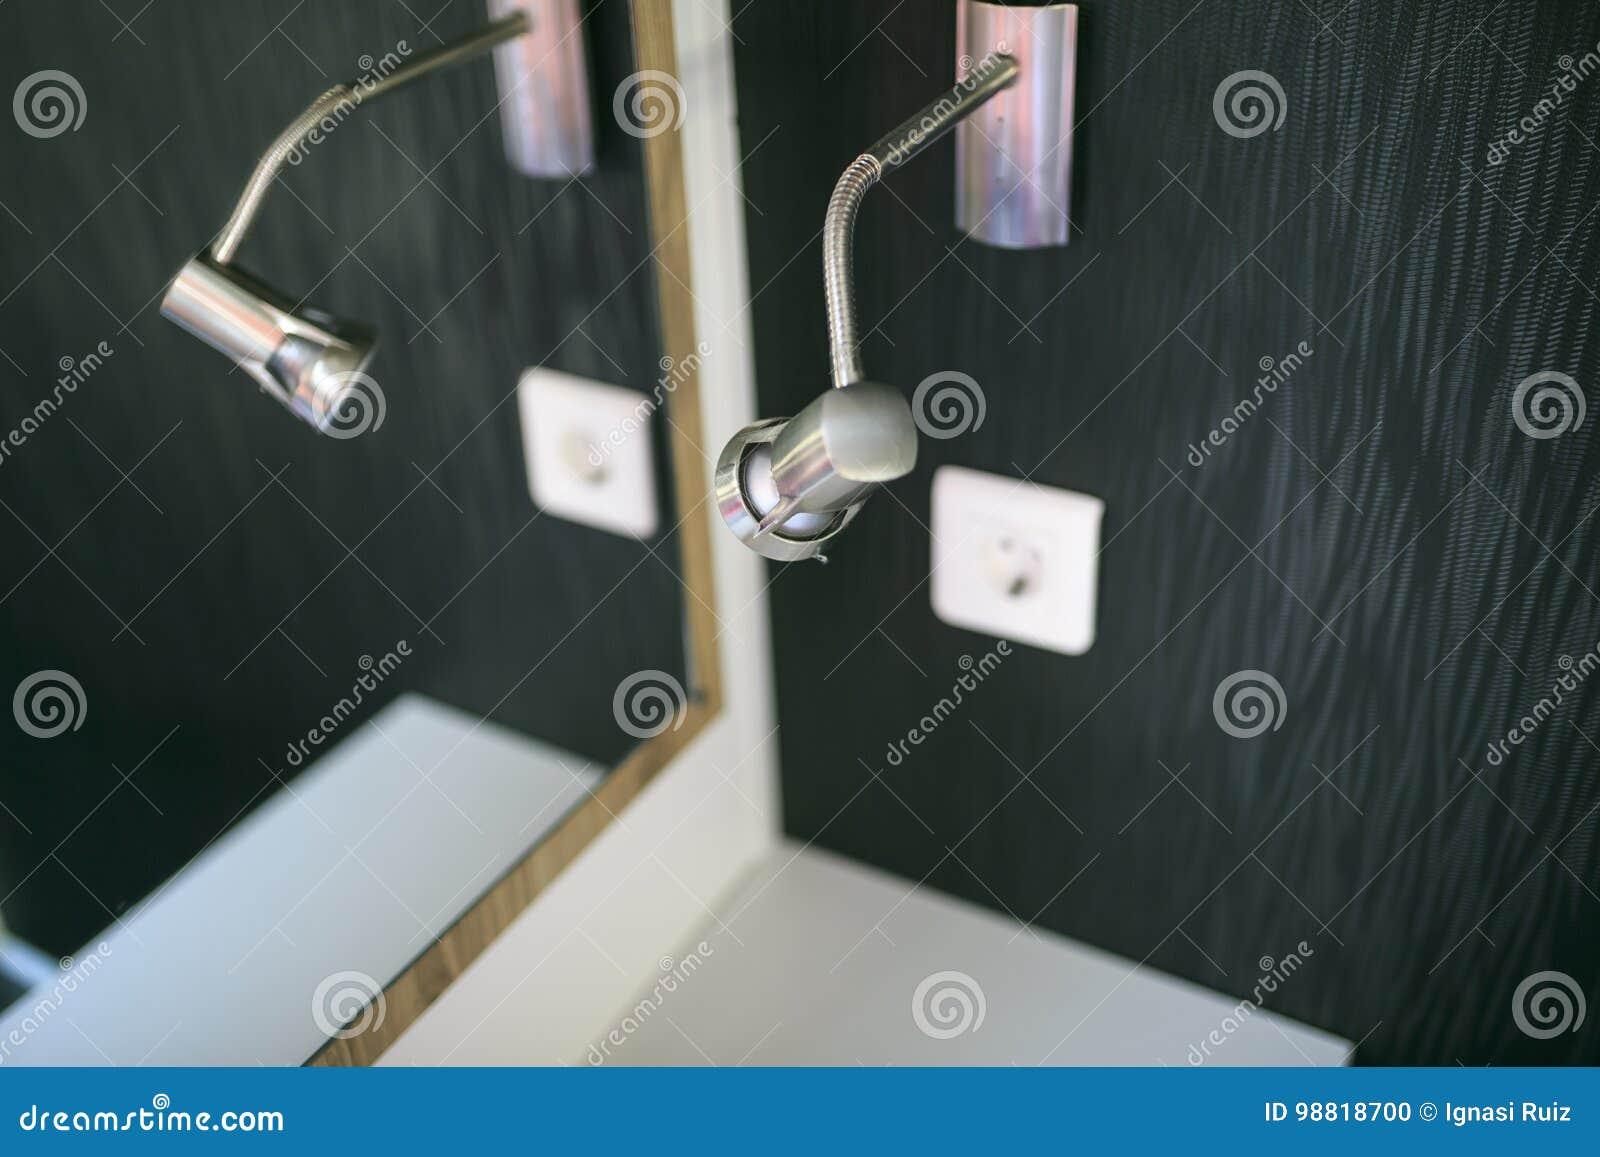 Pouca lâmpada em um toilette